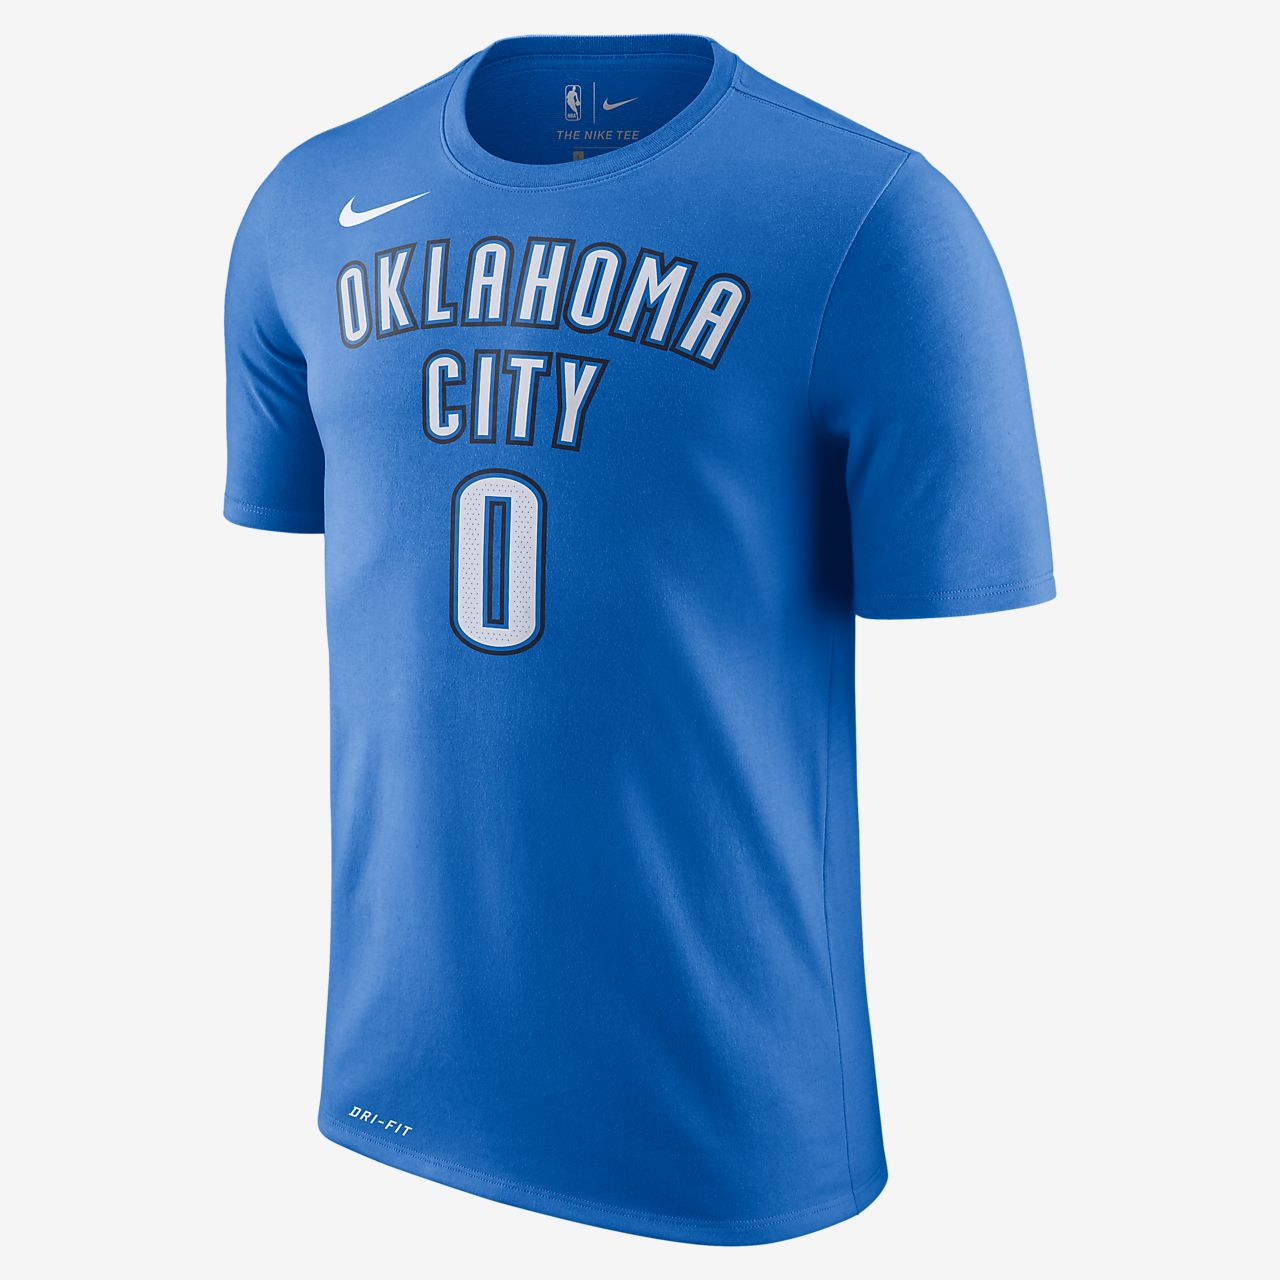 ... Russell Westbrook Oklahoma City Thunder Nike Dry Men's NBA T-Shirt